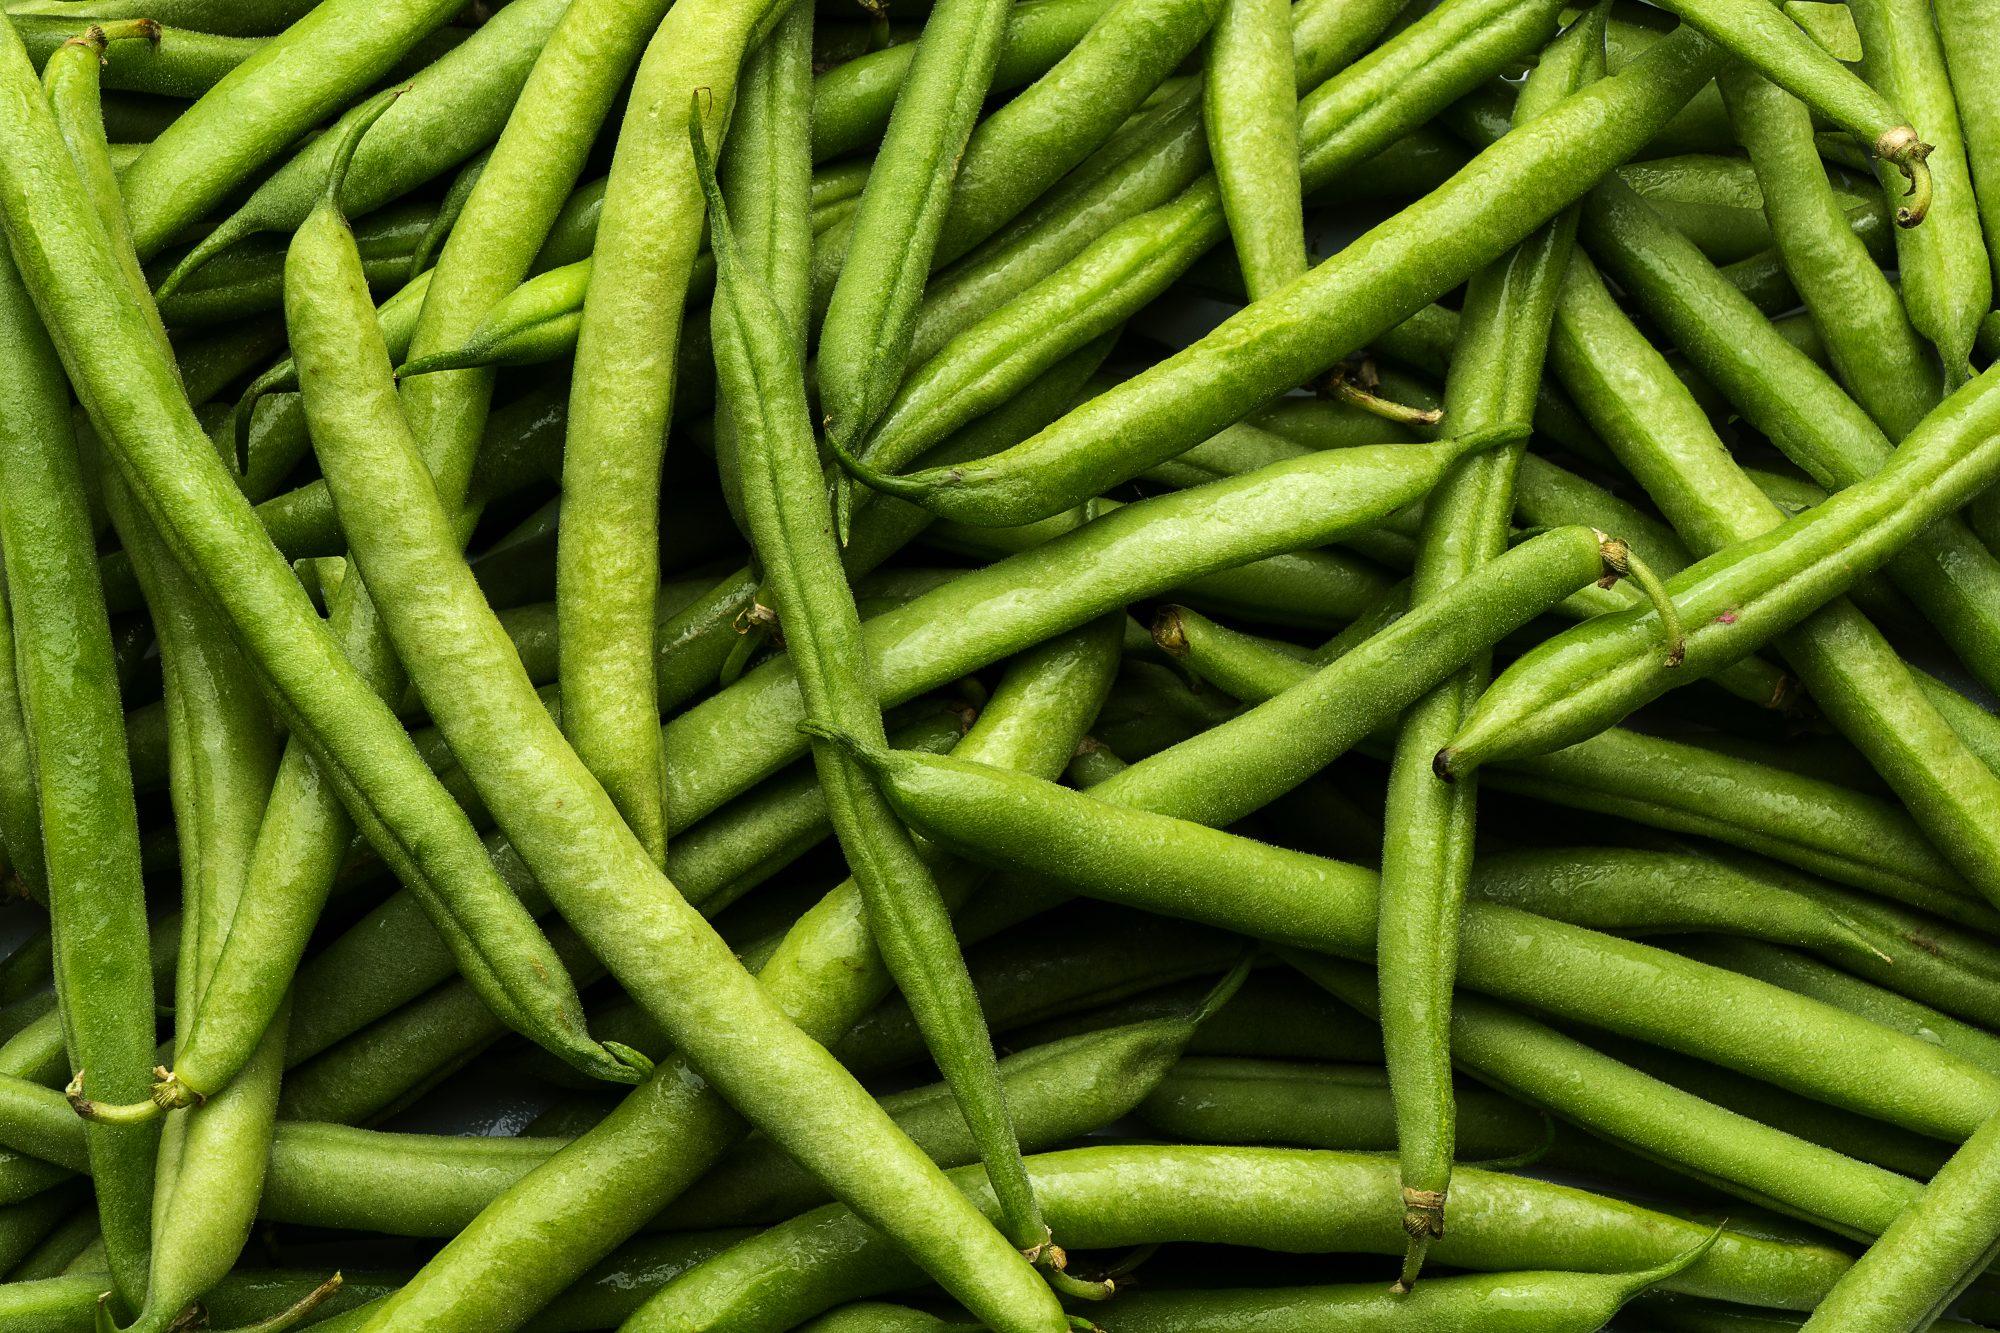 Green Beans Getty 3/31/20